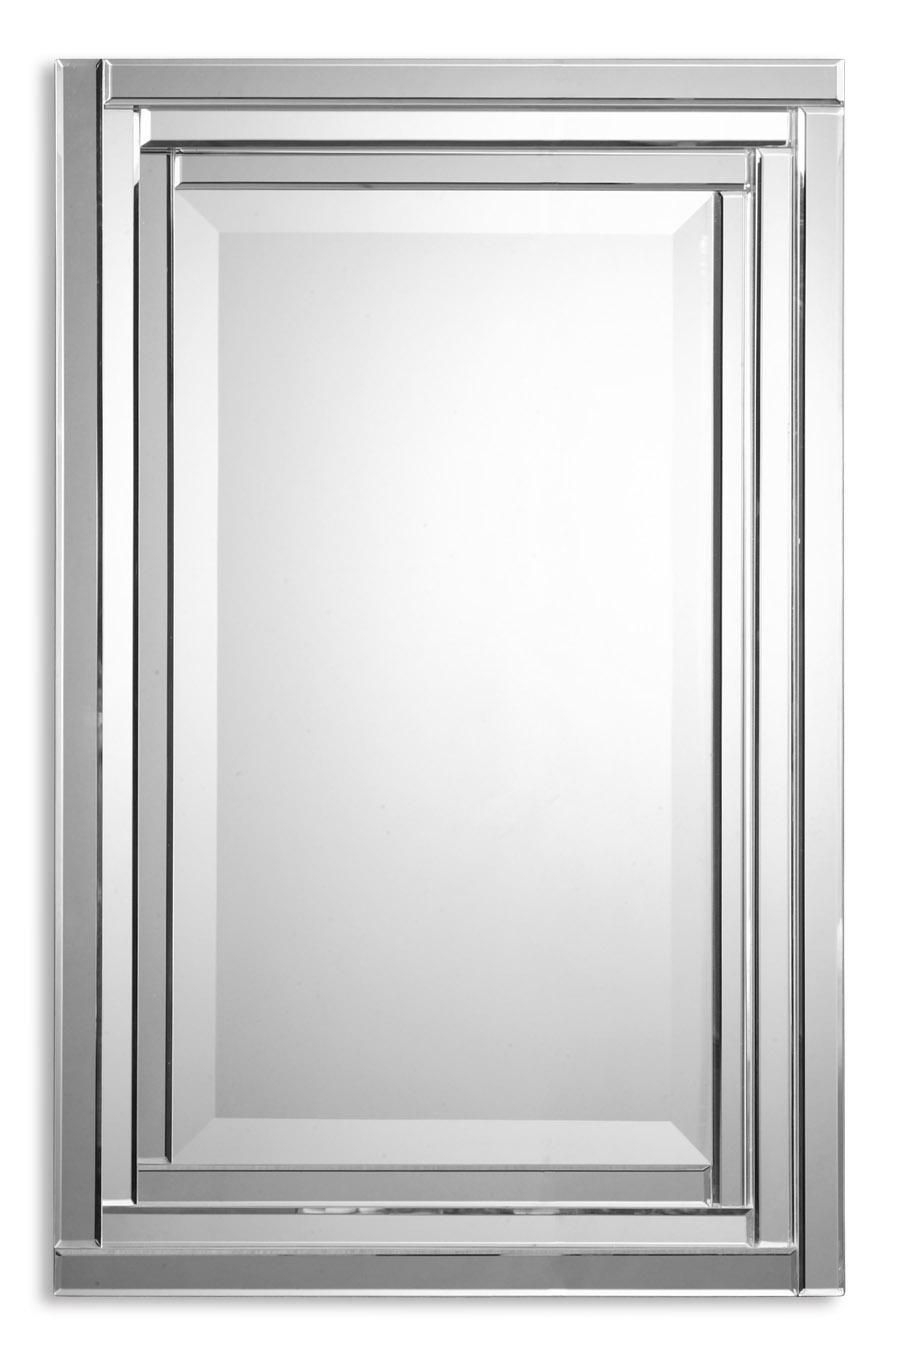 Uttermost Mirrors Alanna Vanity Mirror - Item Number: 08027 B